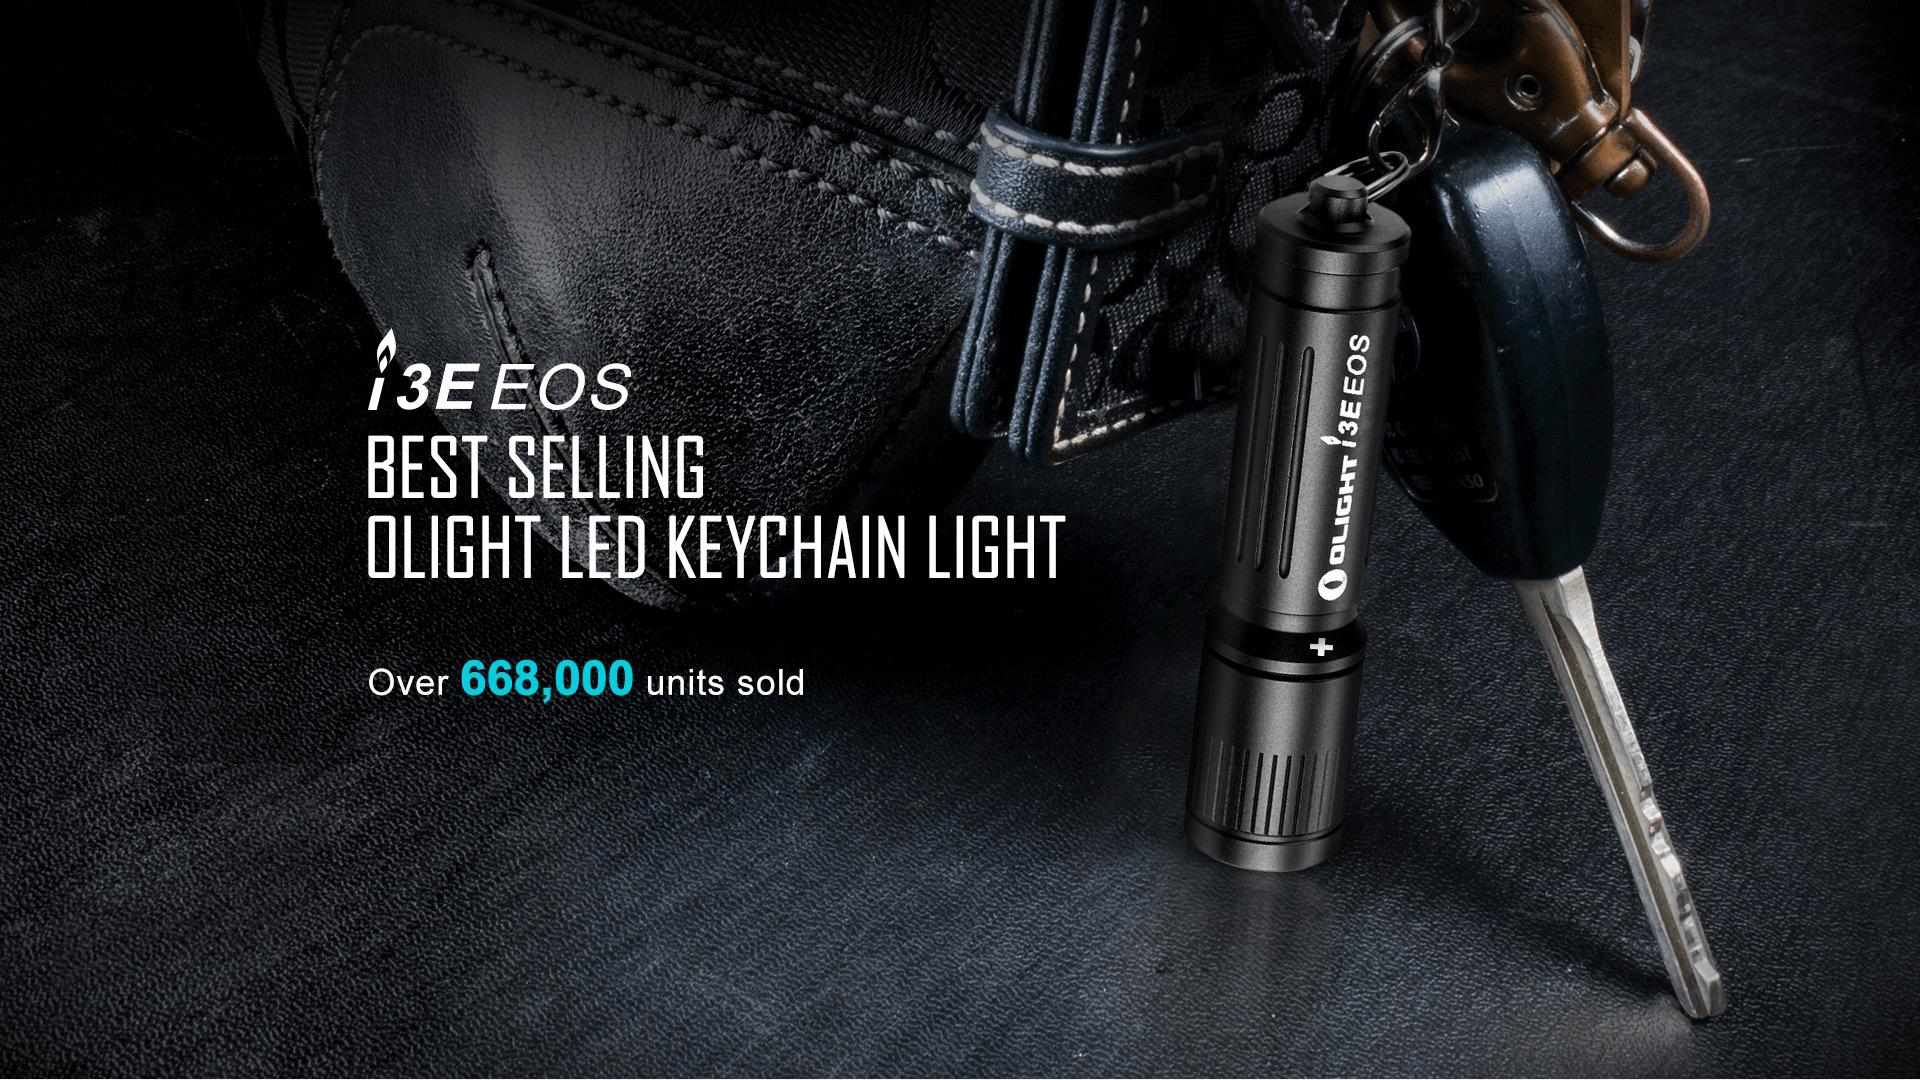 OLIGHT I3E EOS LED 90 Lumens Flashlight